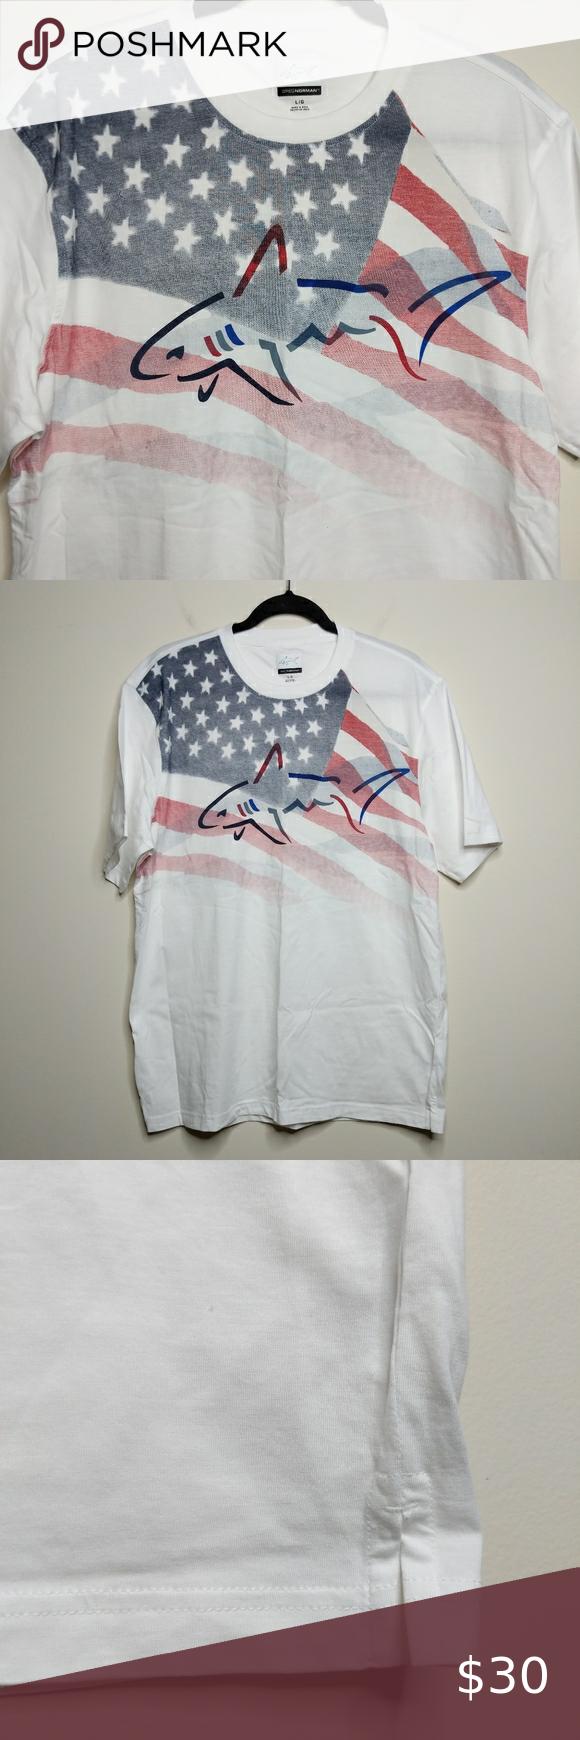 Greg Norman American Flag Tee Size L Euc In 2020 American Flag Tee Flag Tee Clothes Design